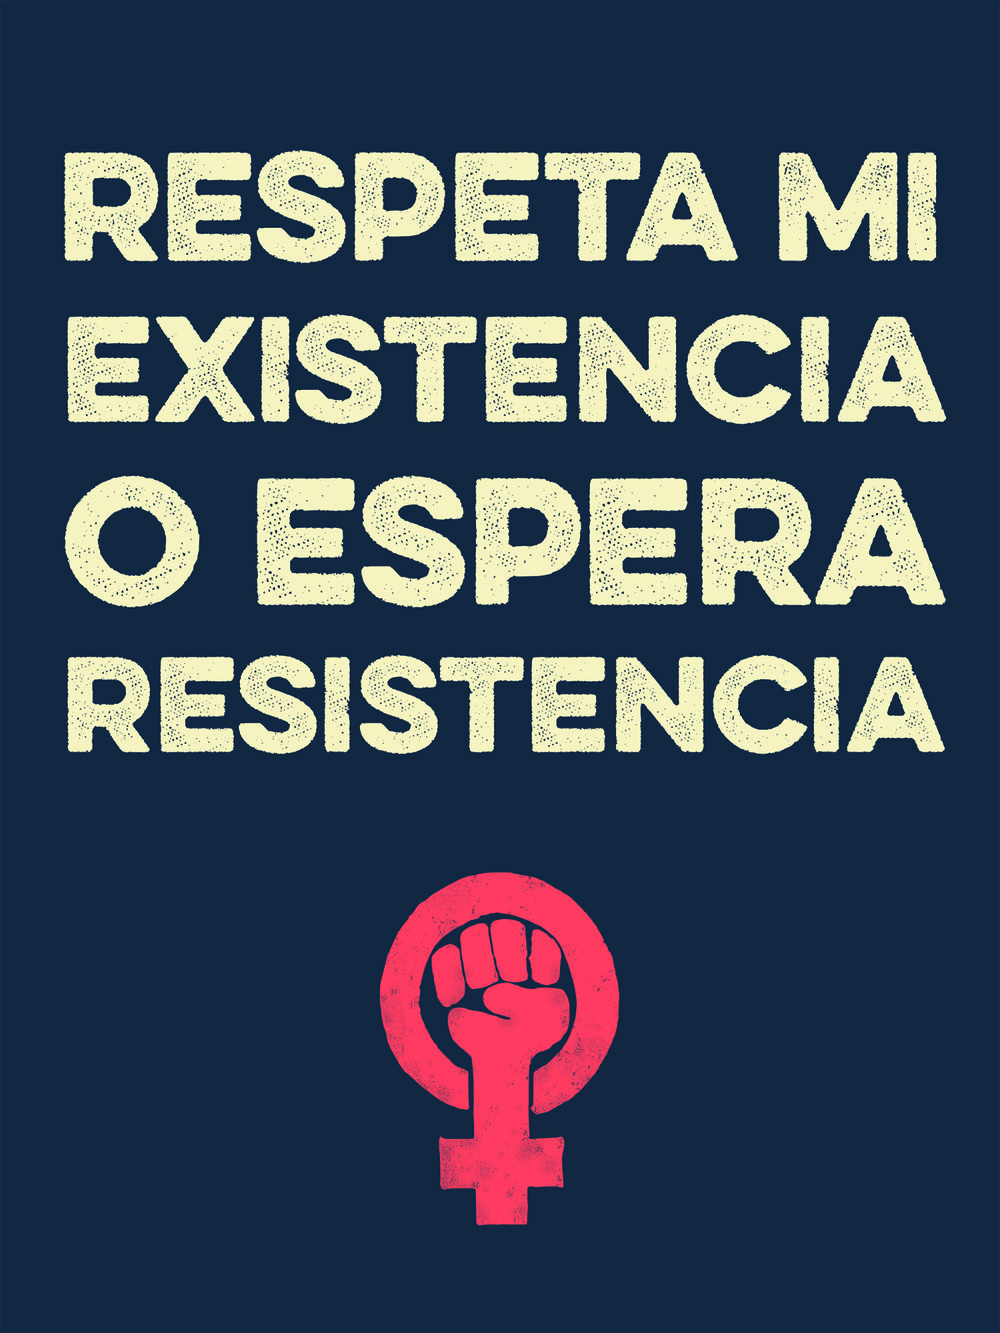 'Respeta' - Victoria Garcia